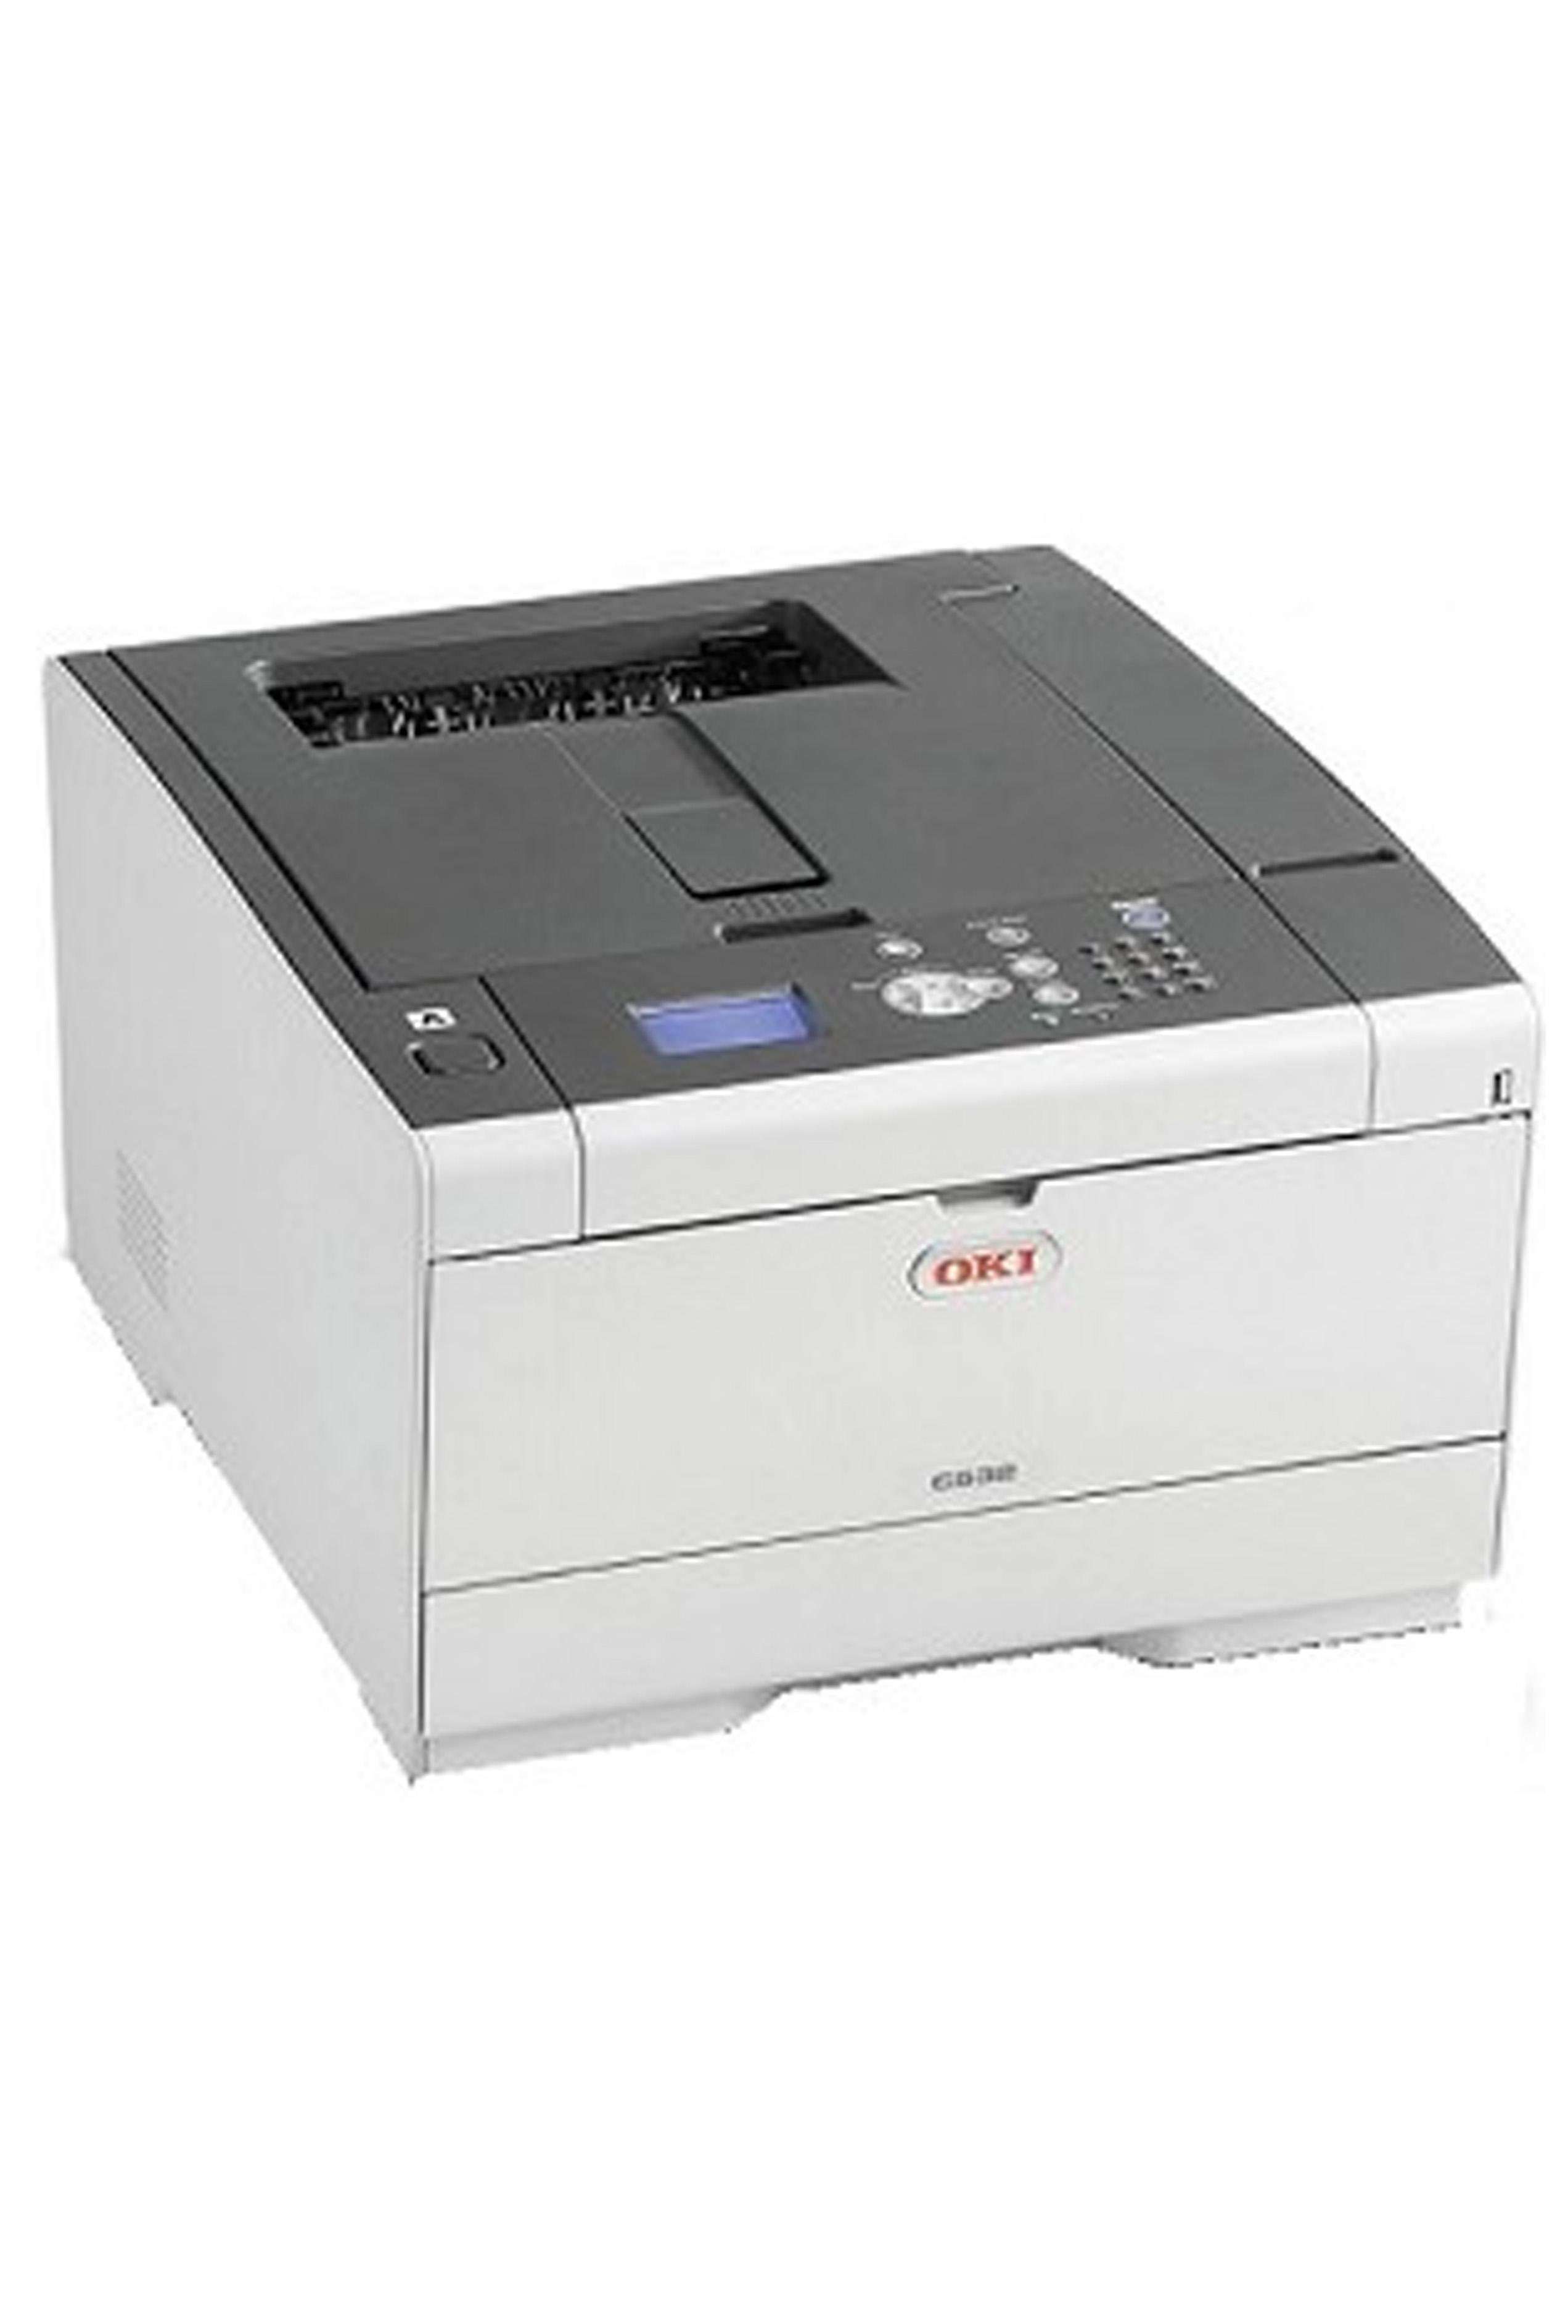 Okidata Color Printer C532dn...